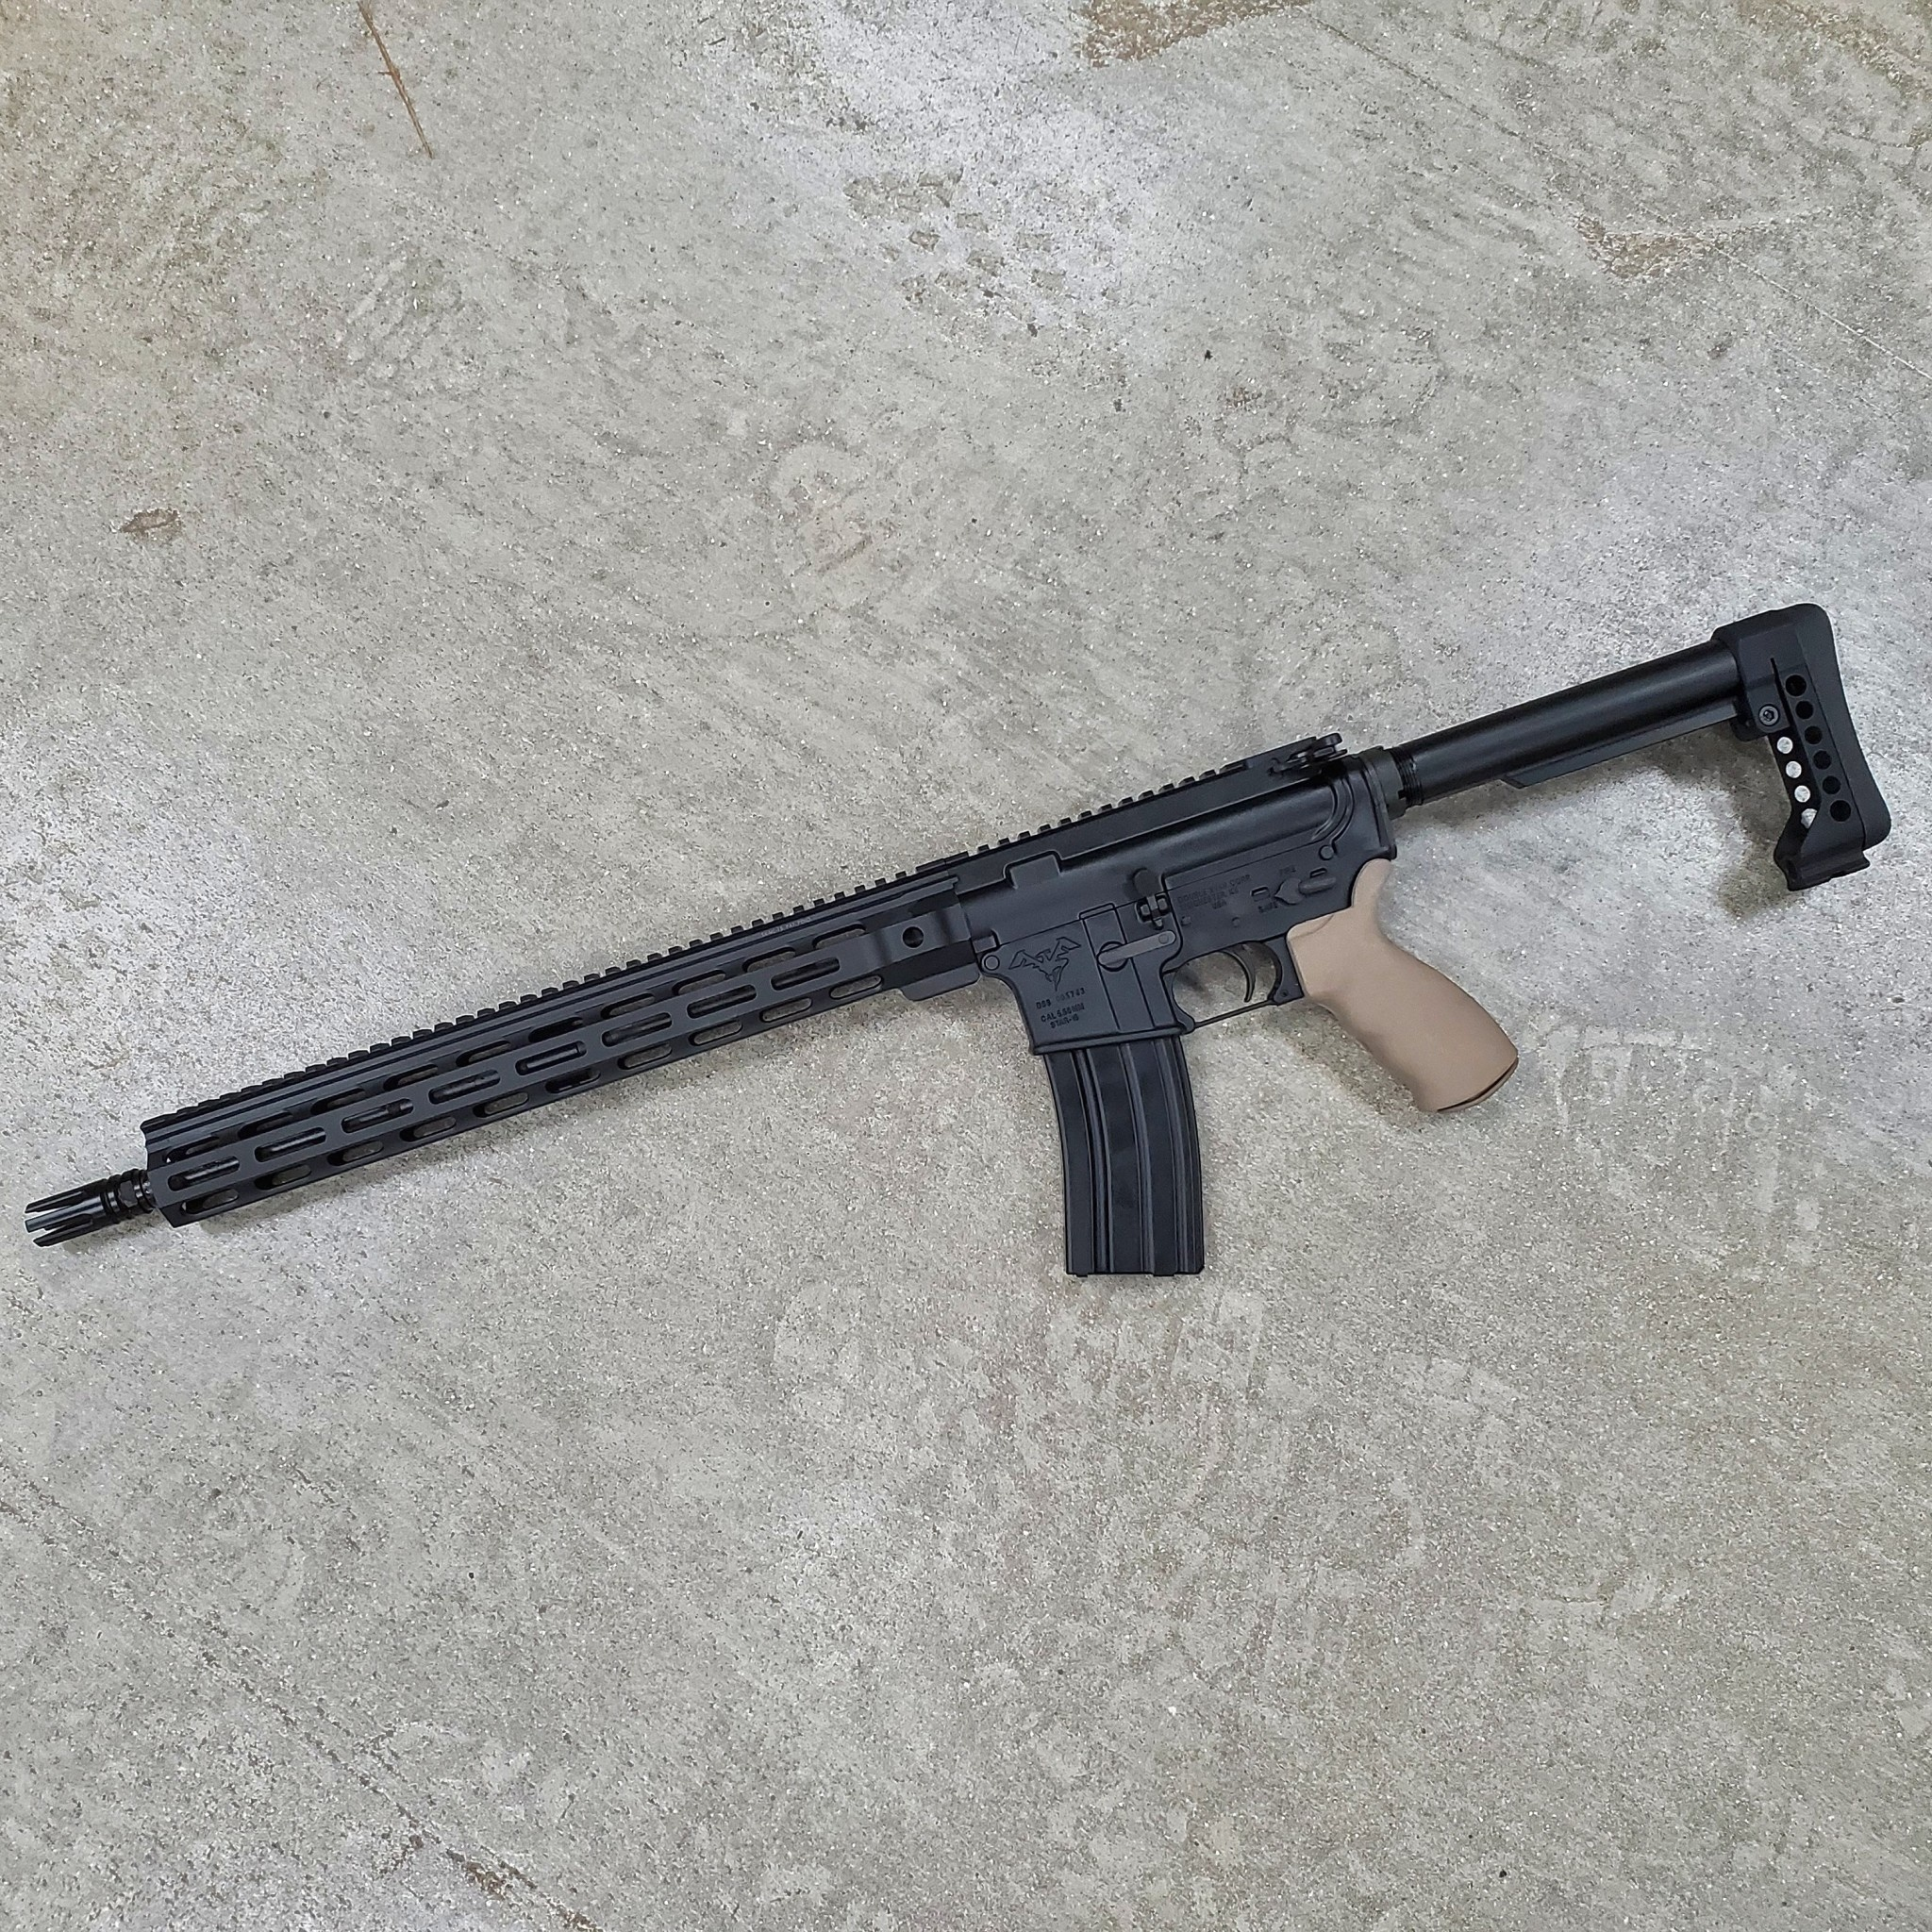 Doublestar M4 5.56 Carbine, 16'', MLOK, 1:7, Carlson Strike flash hider, enhanced extraction system, ergo grip, 7075 T6